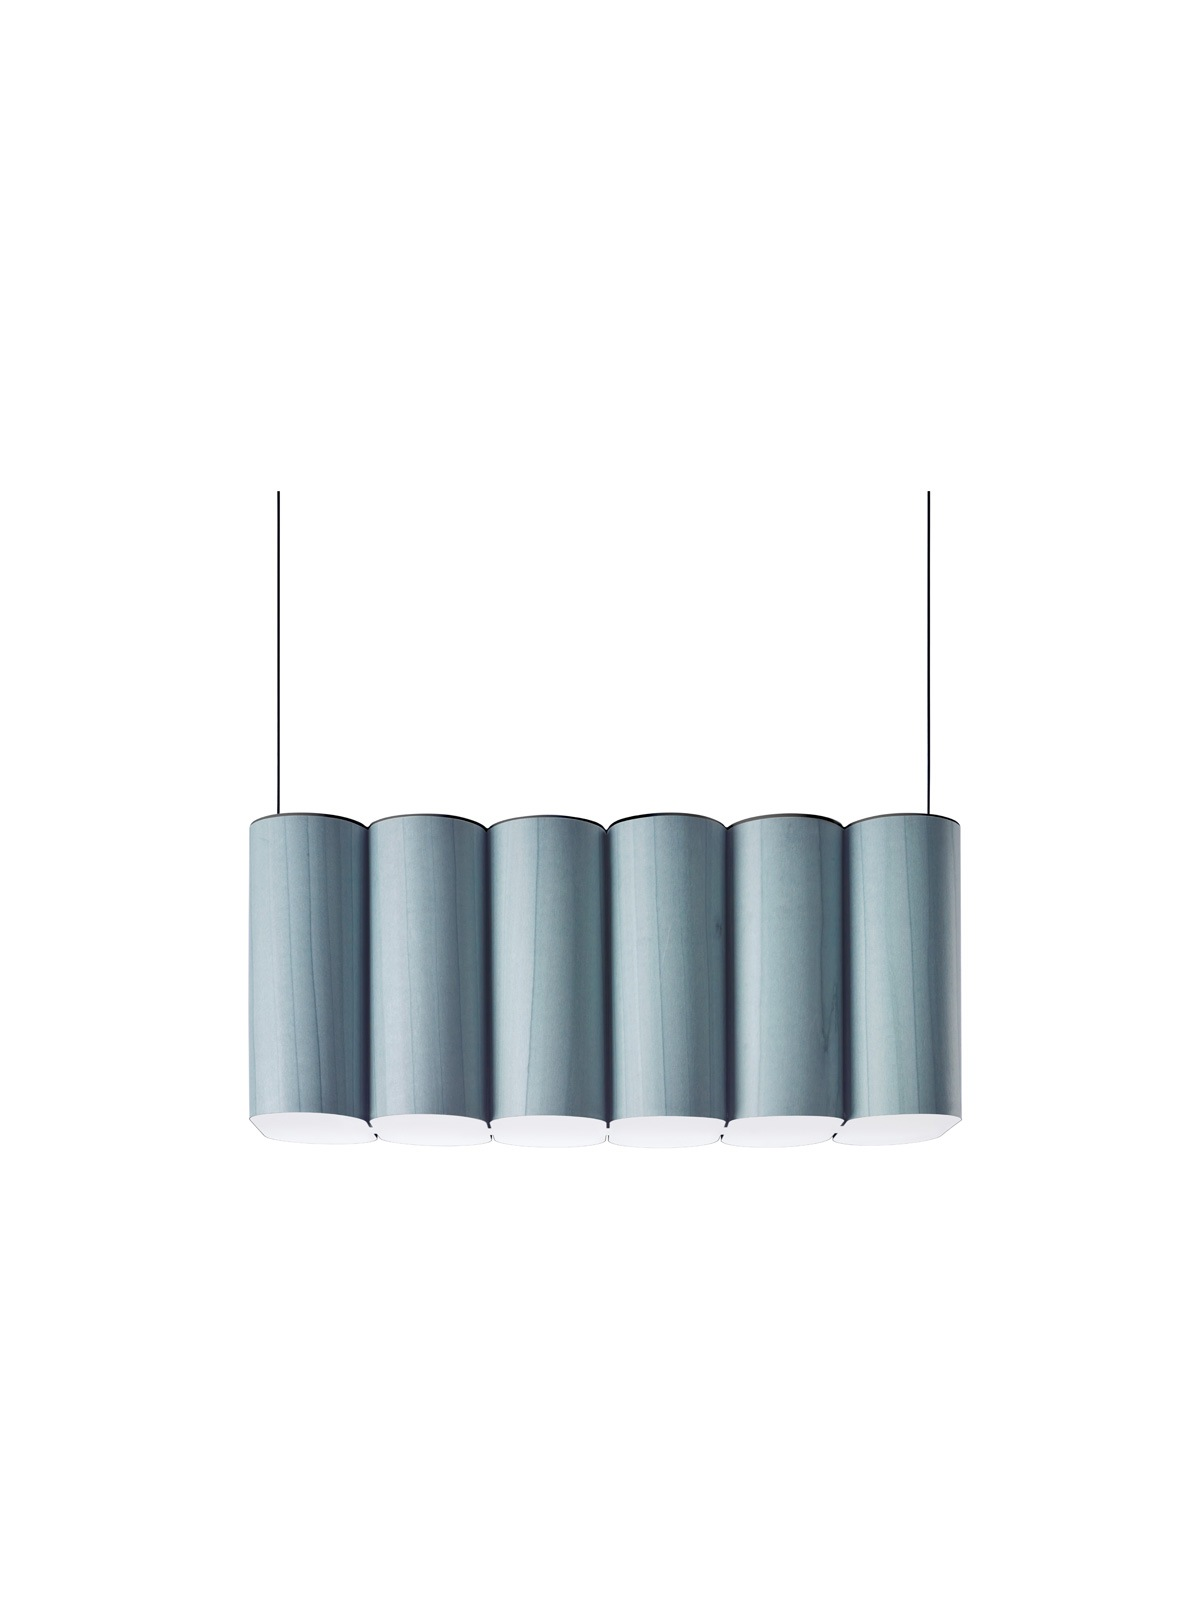 Tomo long LZF Lamps lange Holzleuchte DesignOrt Lampen Berlin Onlineshop